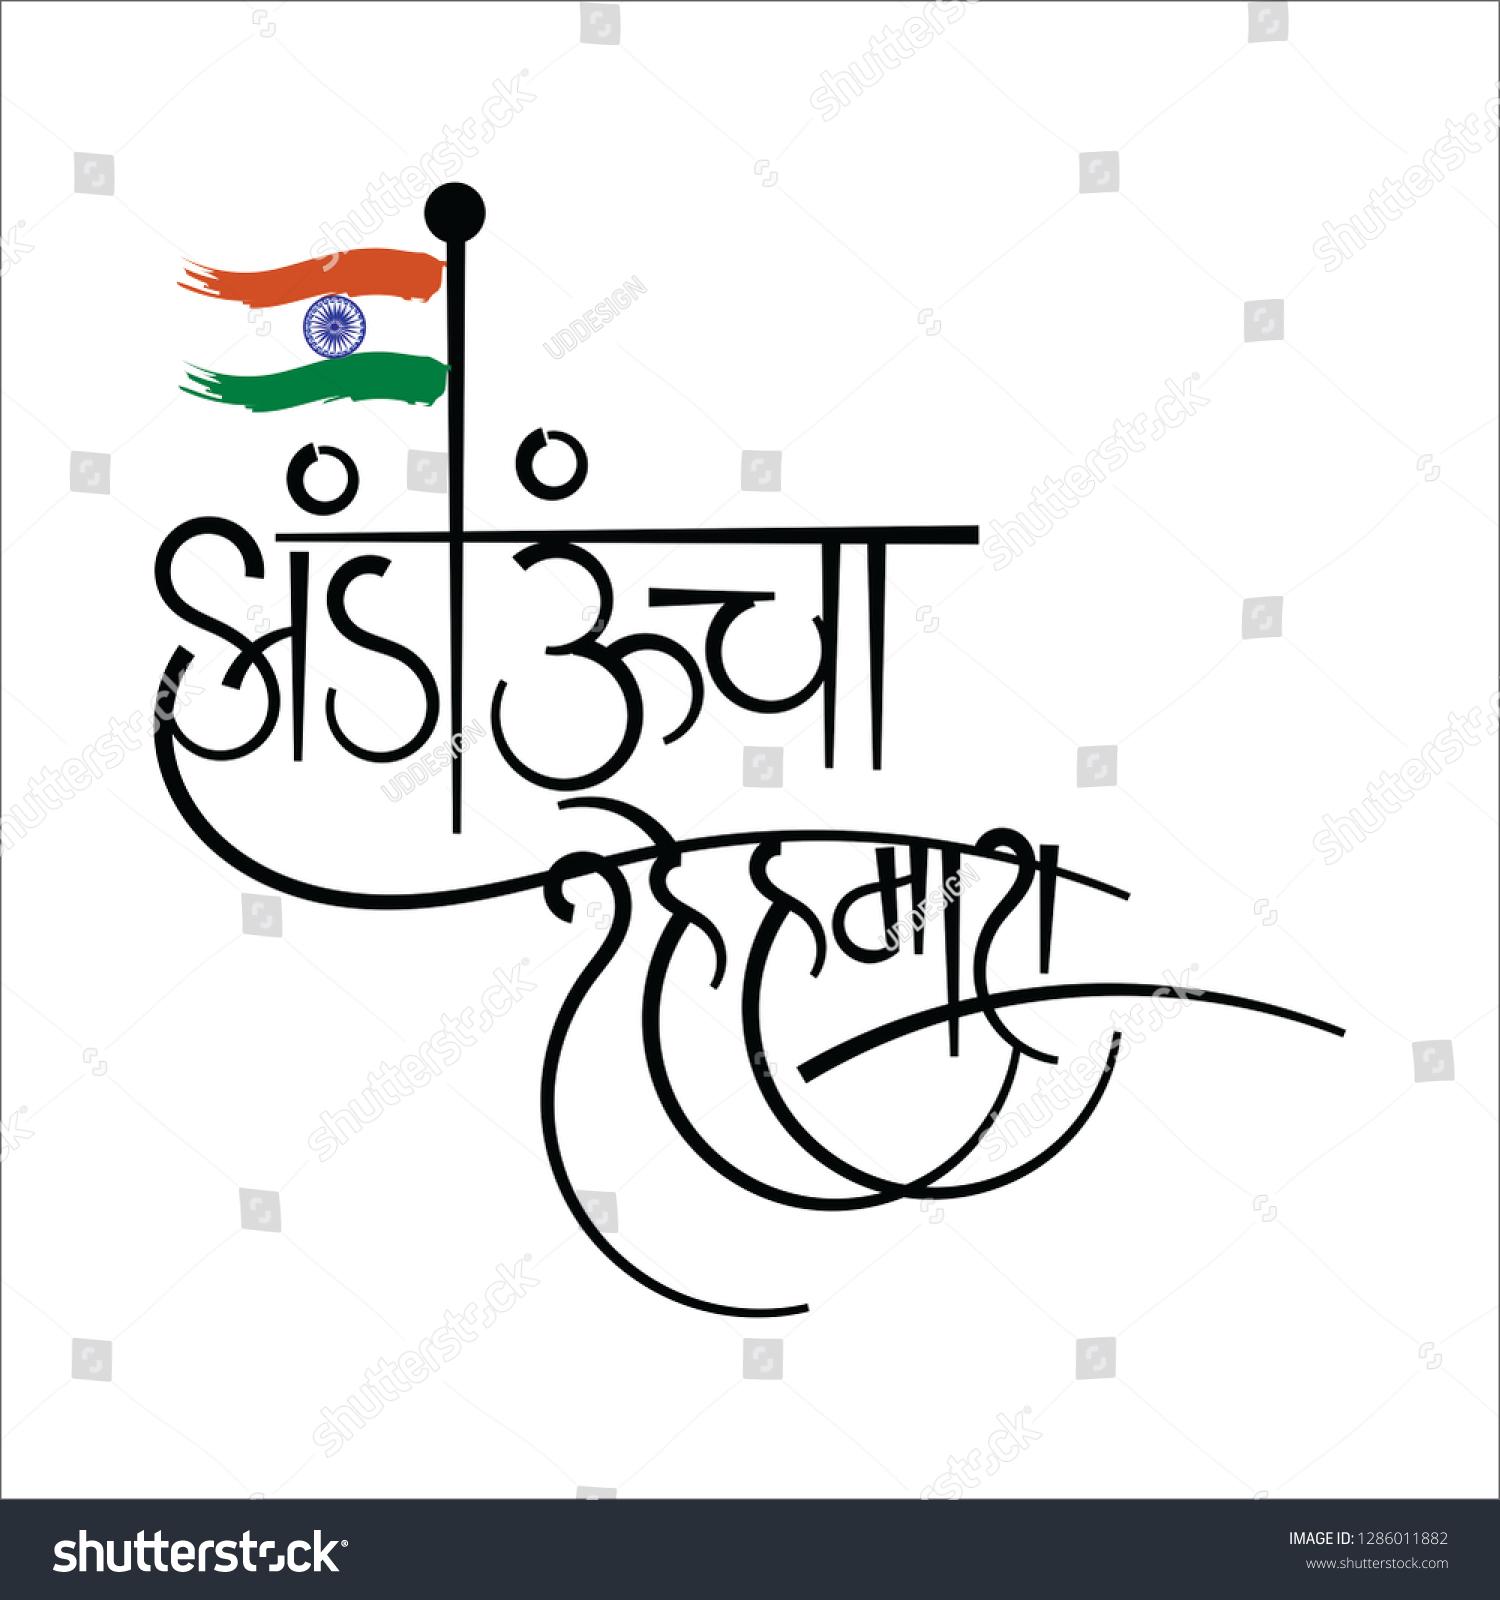 Stylish Hindi Text Jhanda Uncha Rahe Stock Vector Royalty Free 1286011882